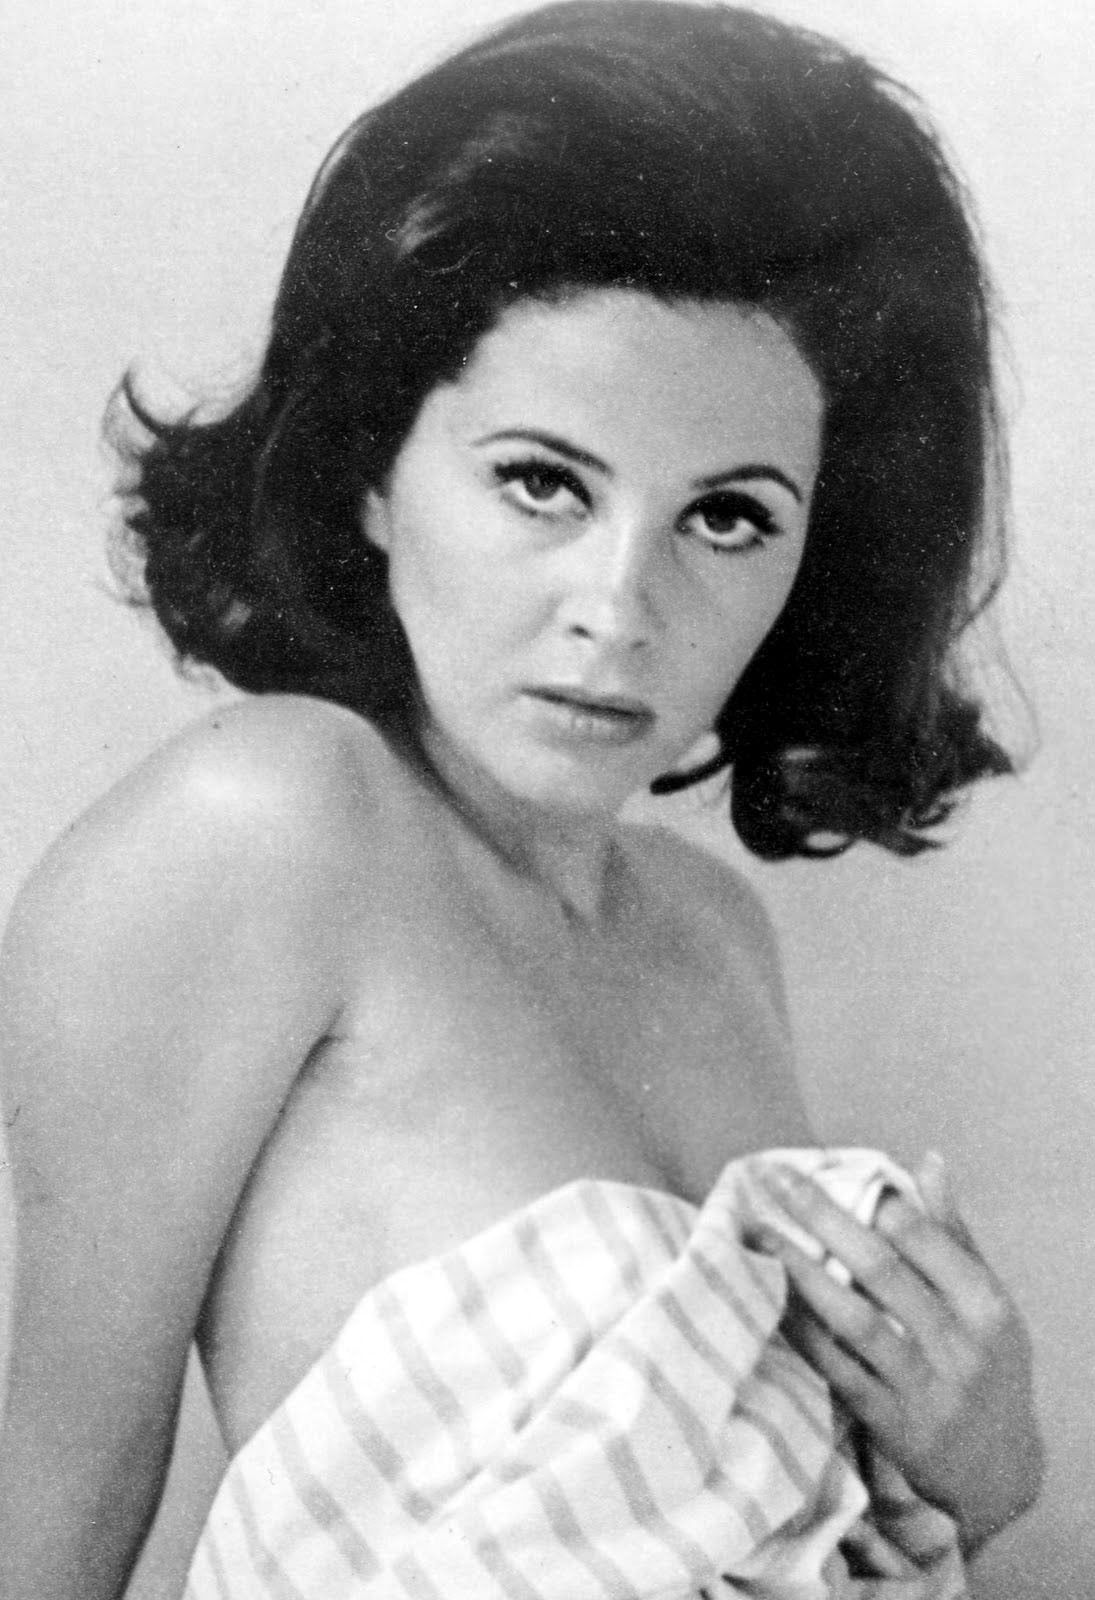 Celebrity Barbara Parkins nudes (87 photos), Pussy, Leaked, Boobs, legs 2006